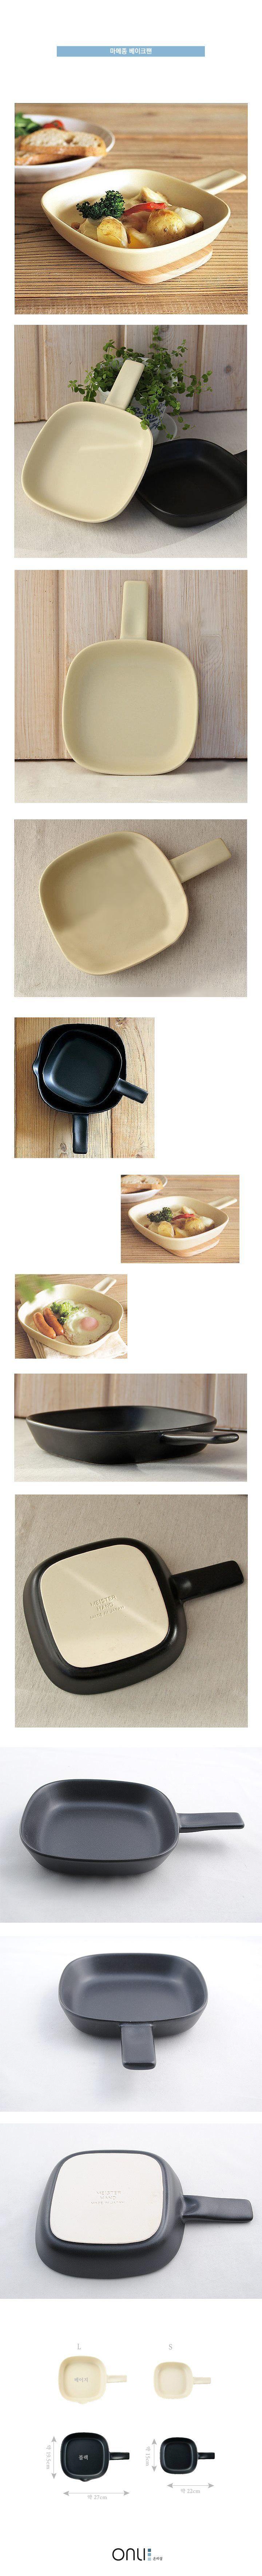 ONLI 온리샵 : 마메종 툴스 베이크팬 (2사이즈) ※ 일본 수입 직화 가능 도기 오븐 그릴 팬, 냄비, 추천 카페, 키친 그릇